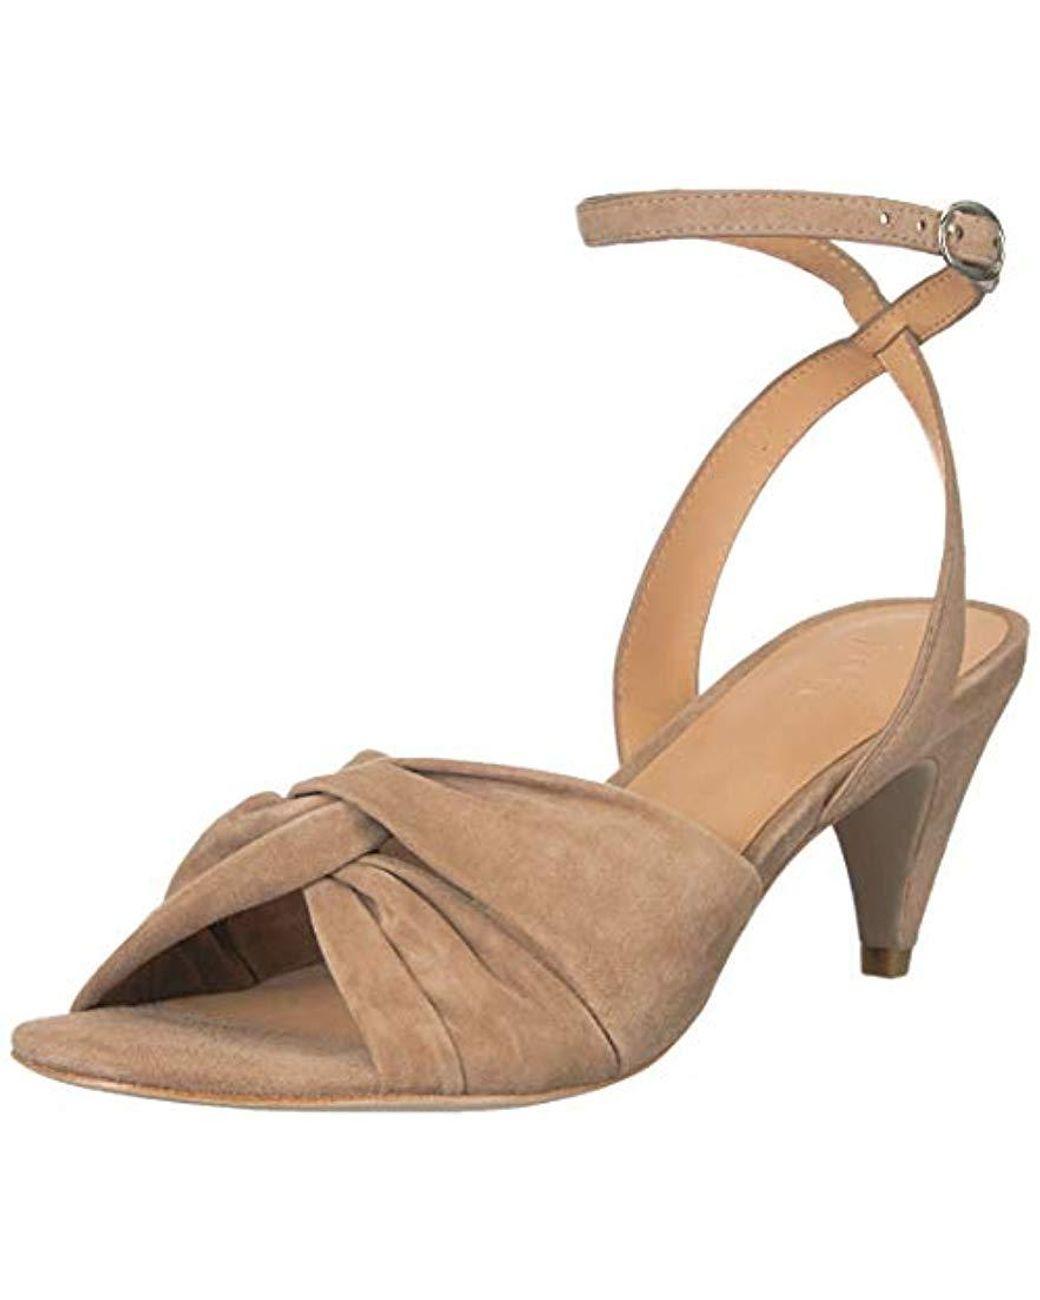 cfee8f480f5b3 Women's Natural Mallison Heeled Sandal